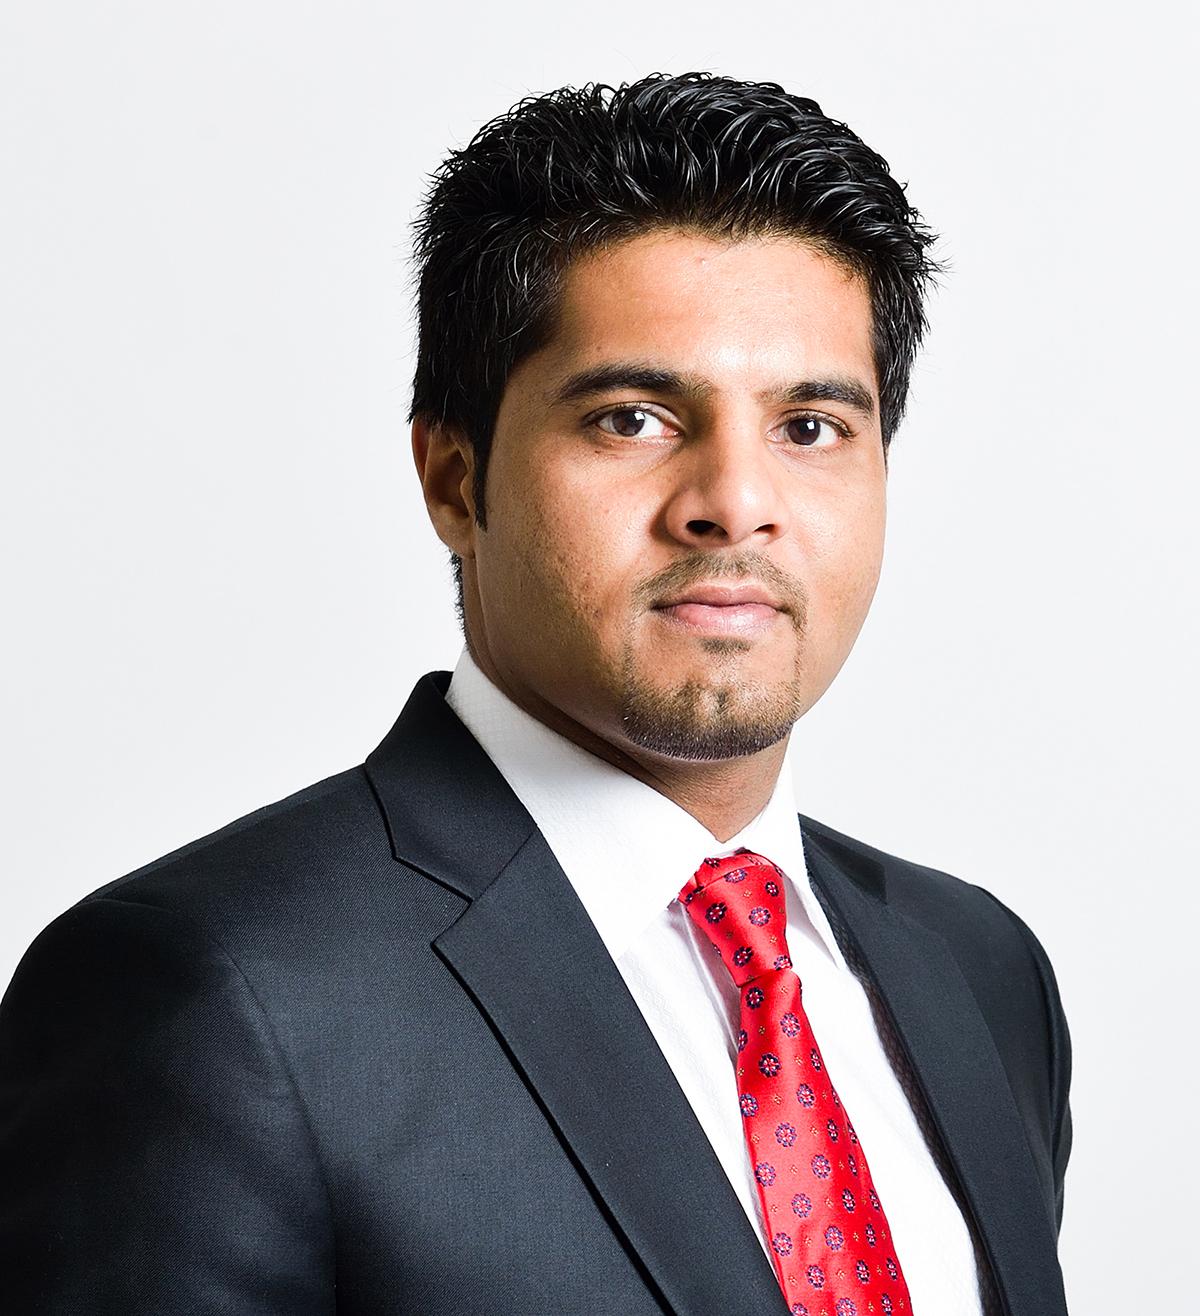 Mr. Akbar - Vice President Healthcare Division